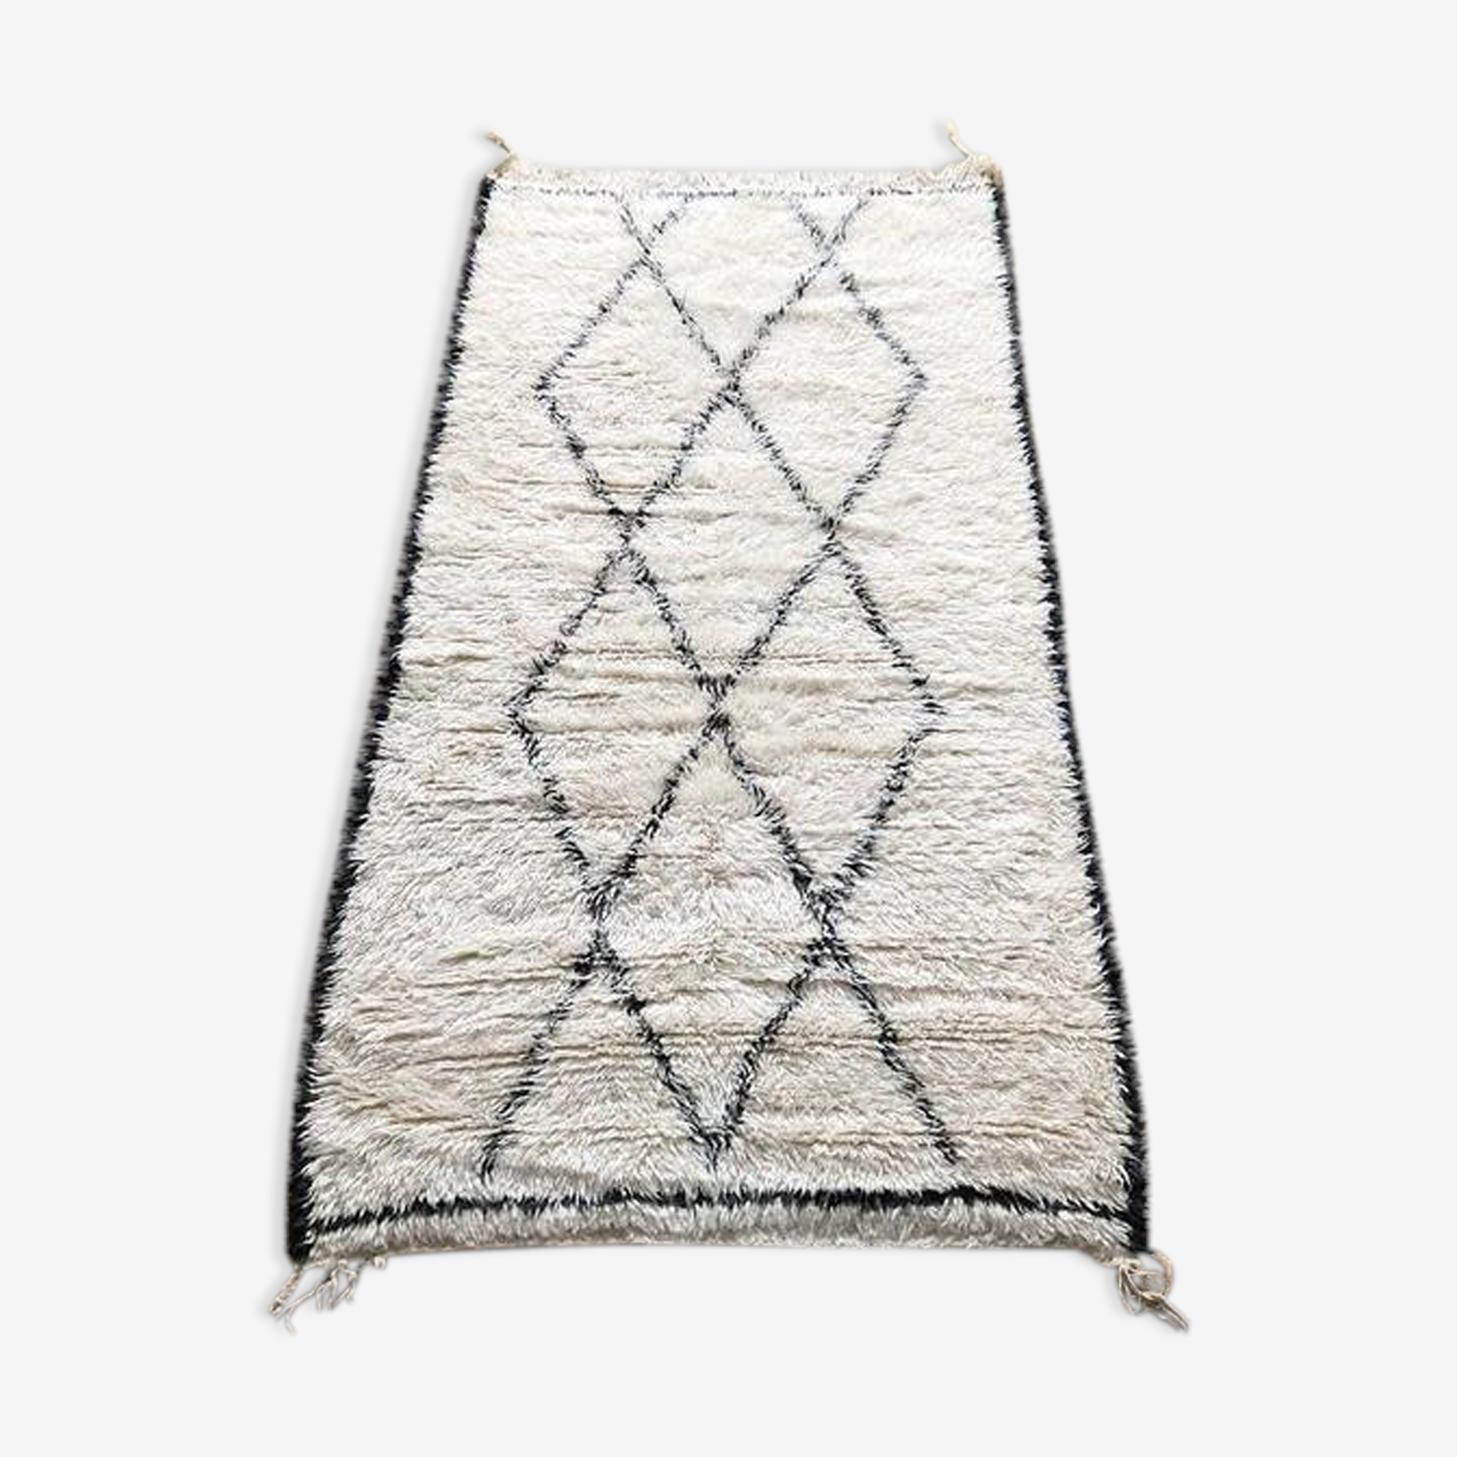 Beni ouarain carpets 220x120cm - 100% wool